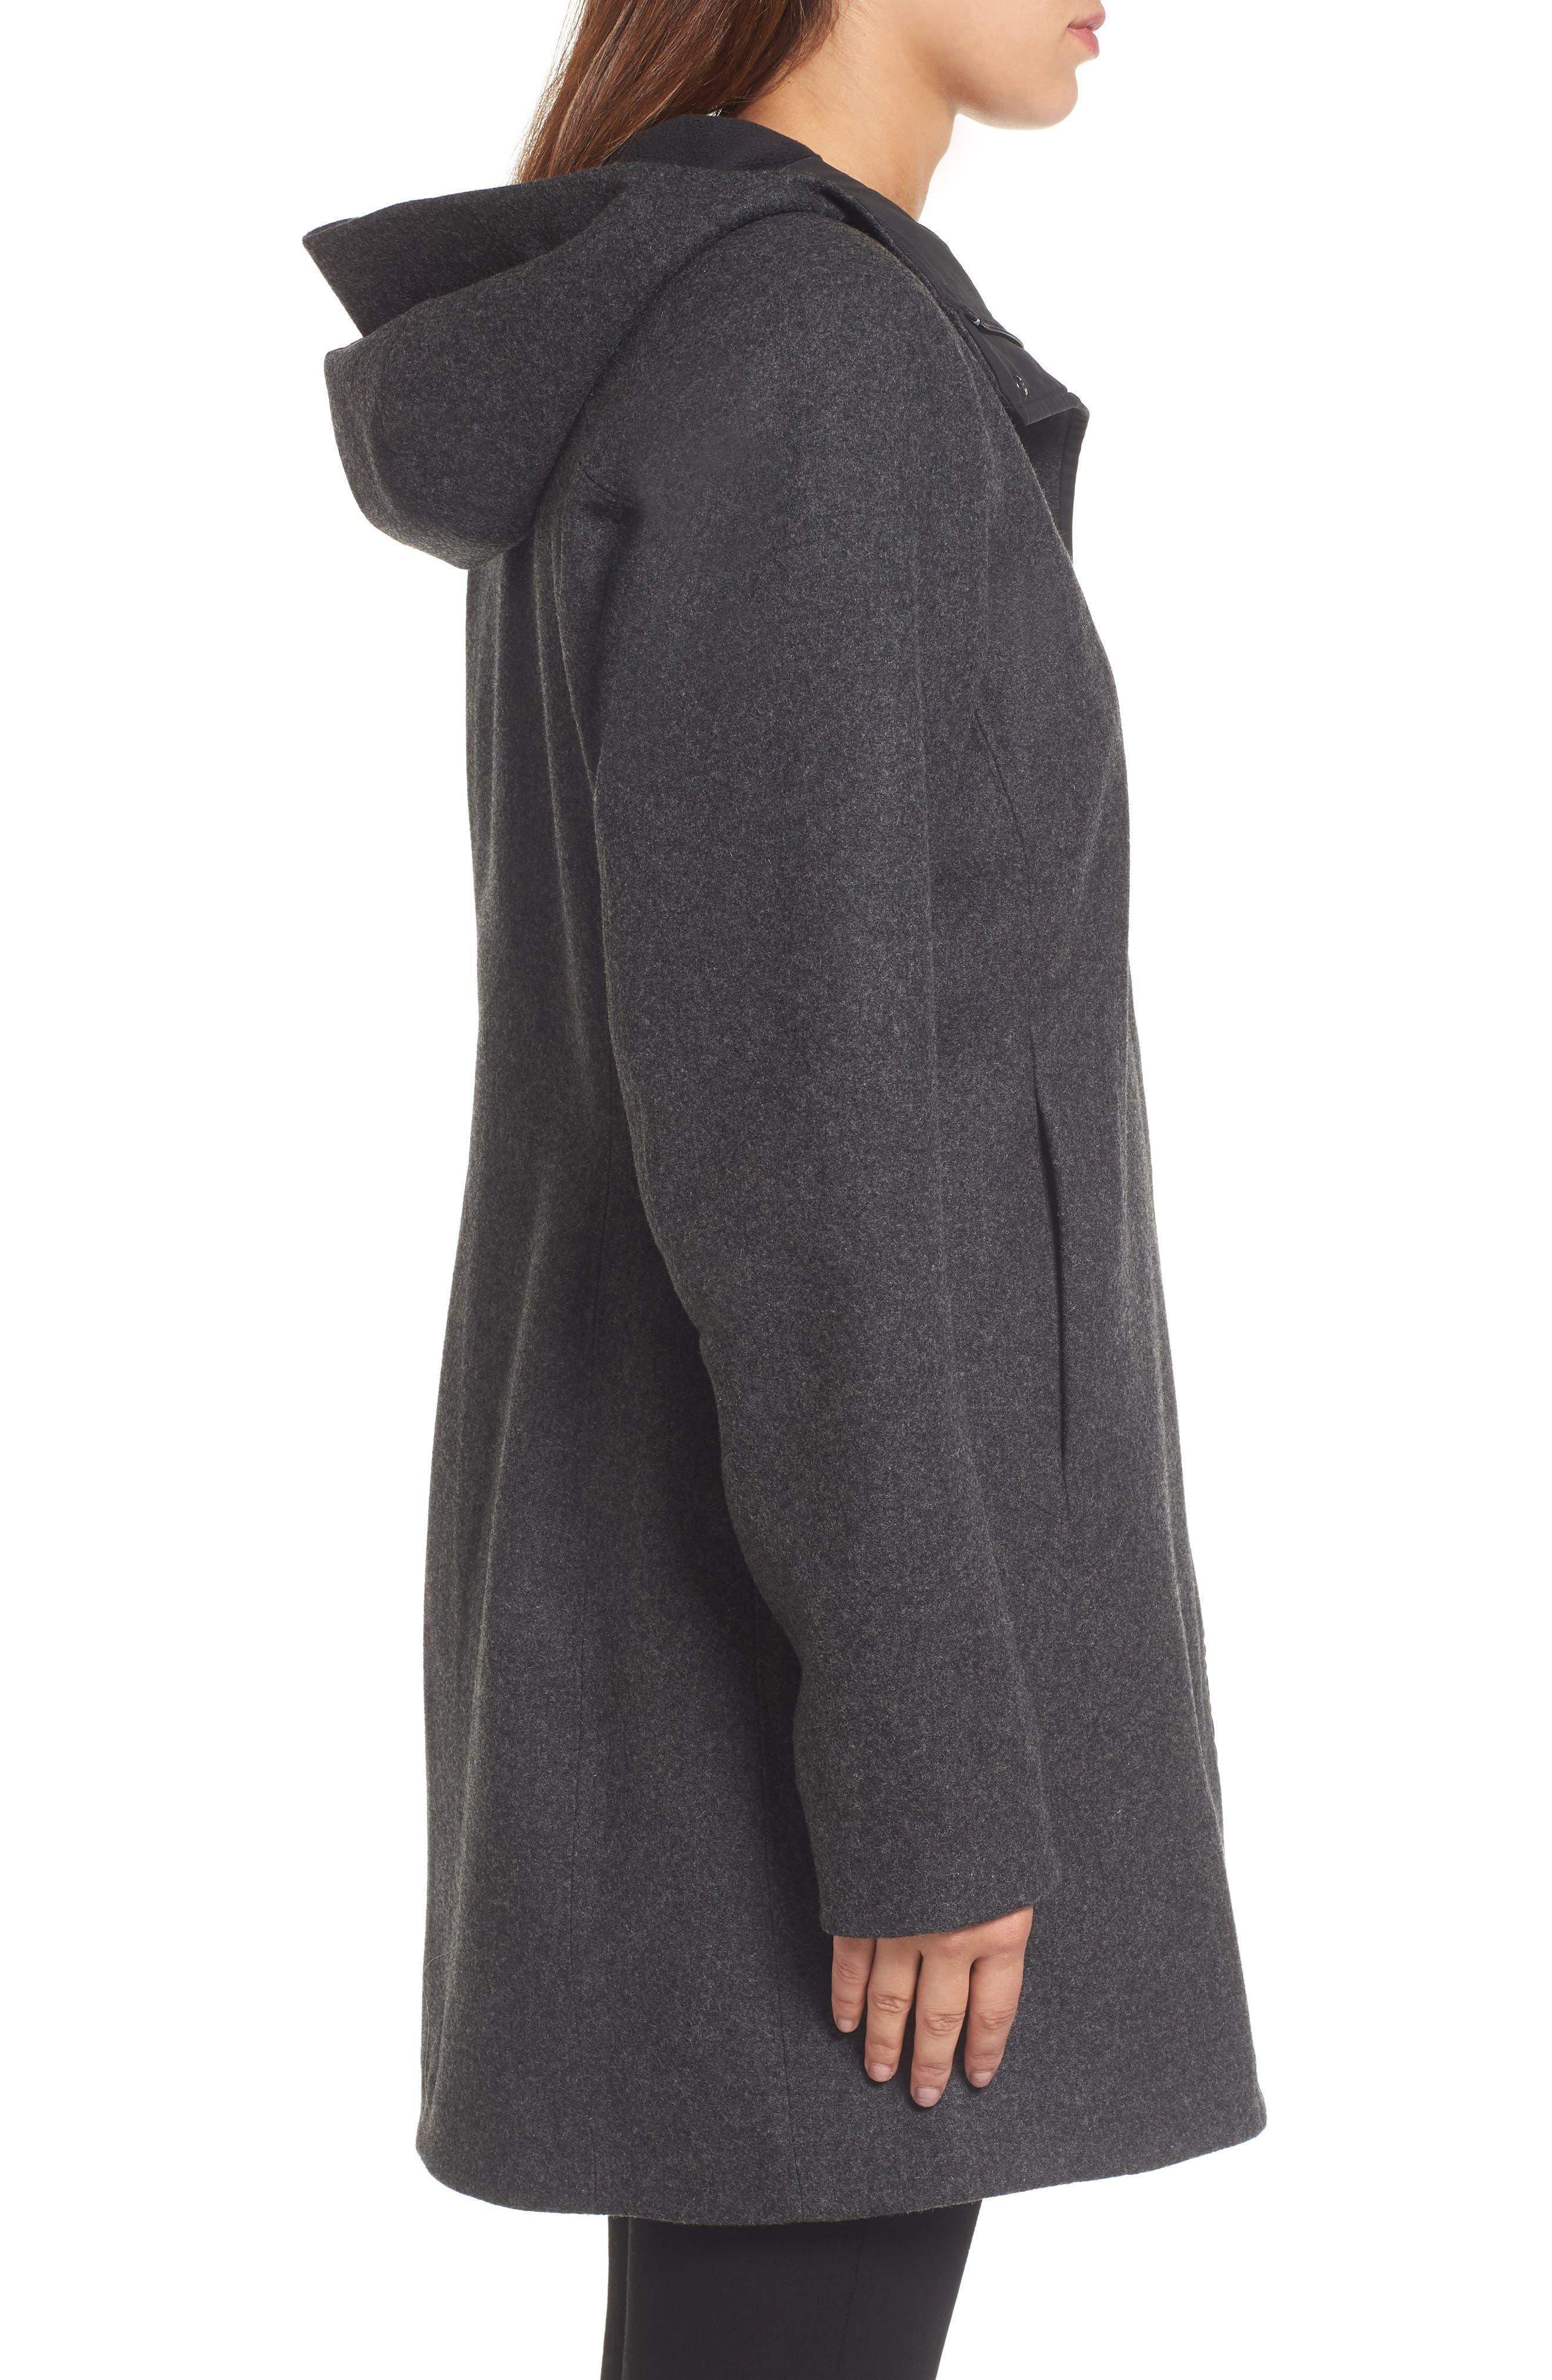 Embra Hooded Walking Coat,                             Alternate thumbnail 3, color,                             001